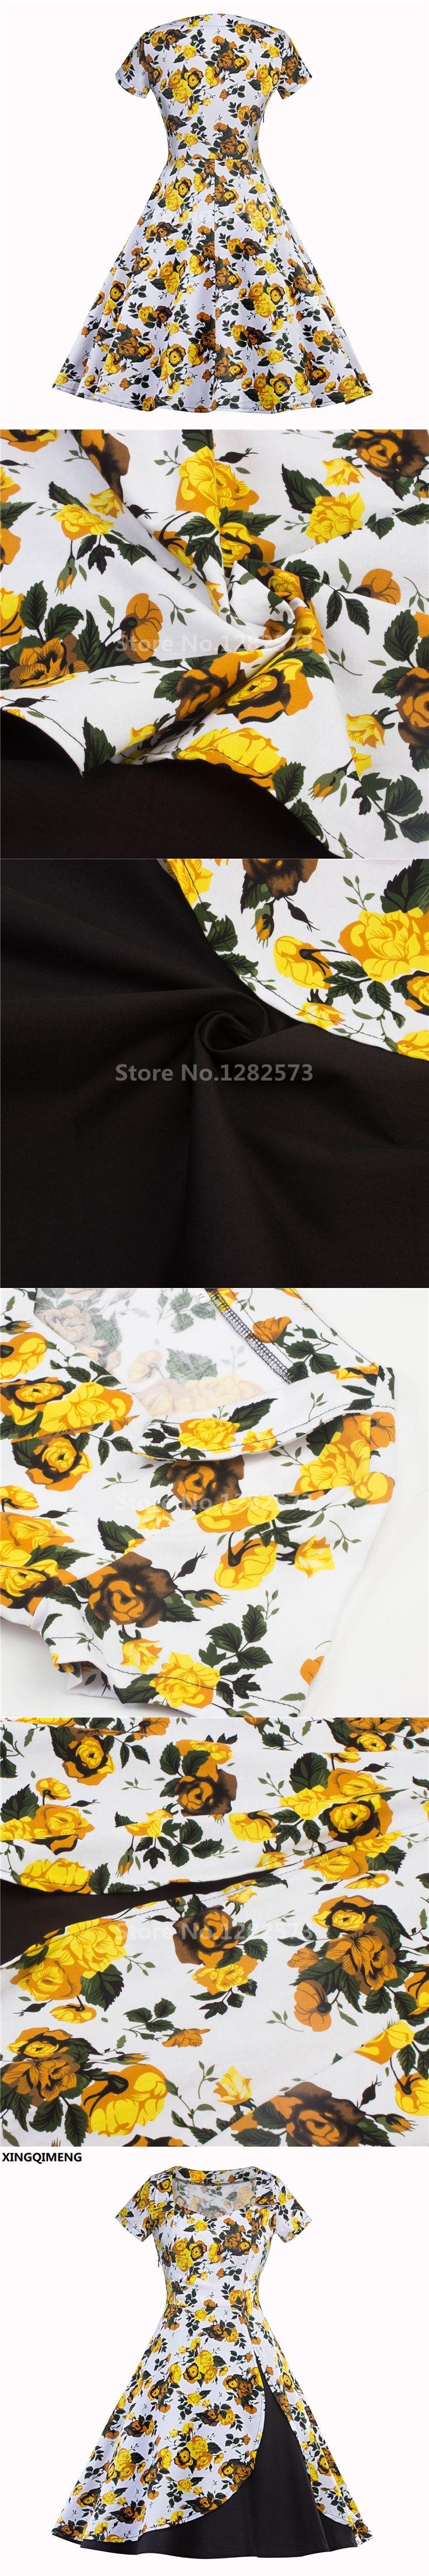 In Stock Cheap Simple Cocktail Dresses Short Sleeve Elegant Homecoming Dress Knee Length Fancy Formal Dresses Floral Print